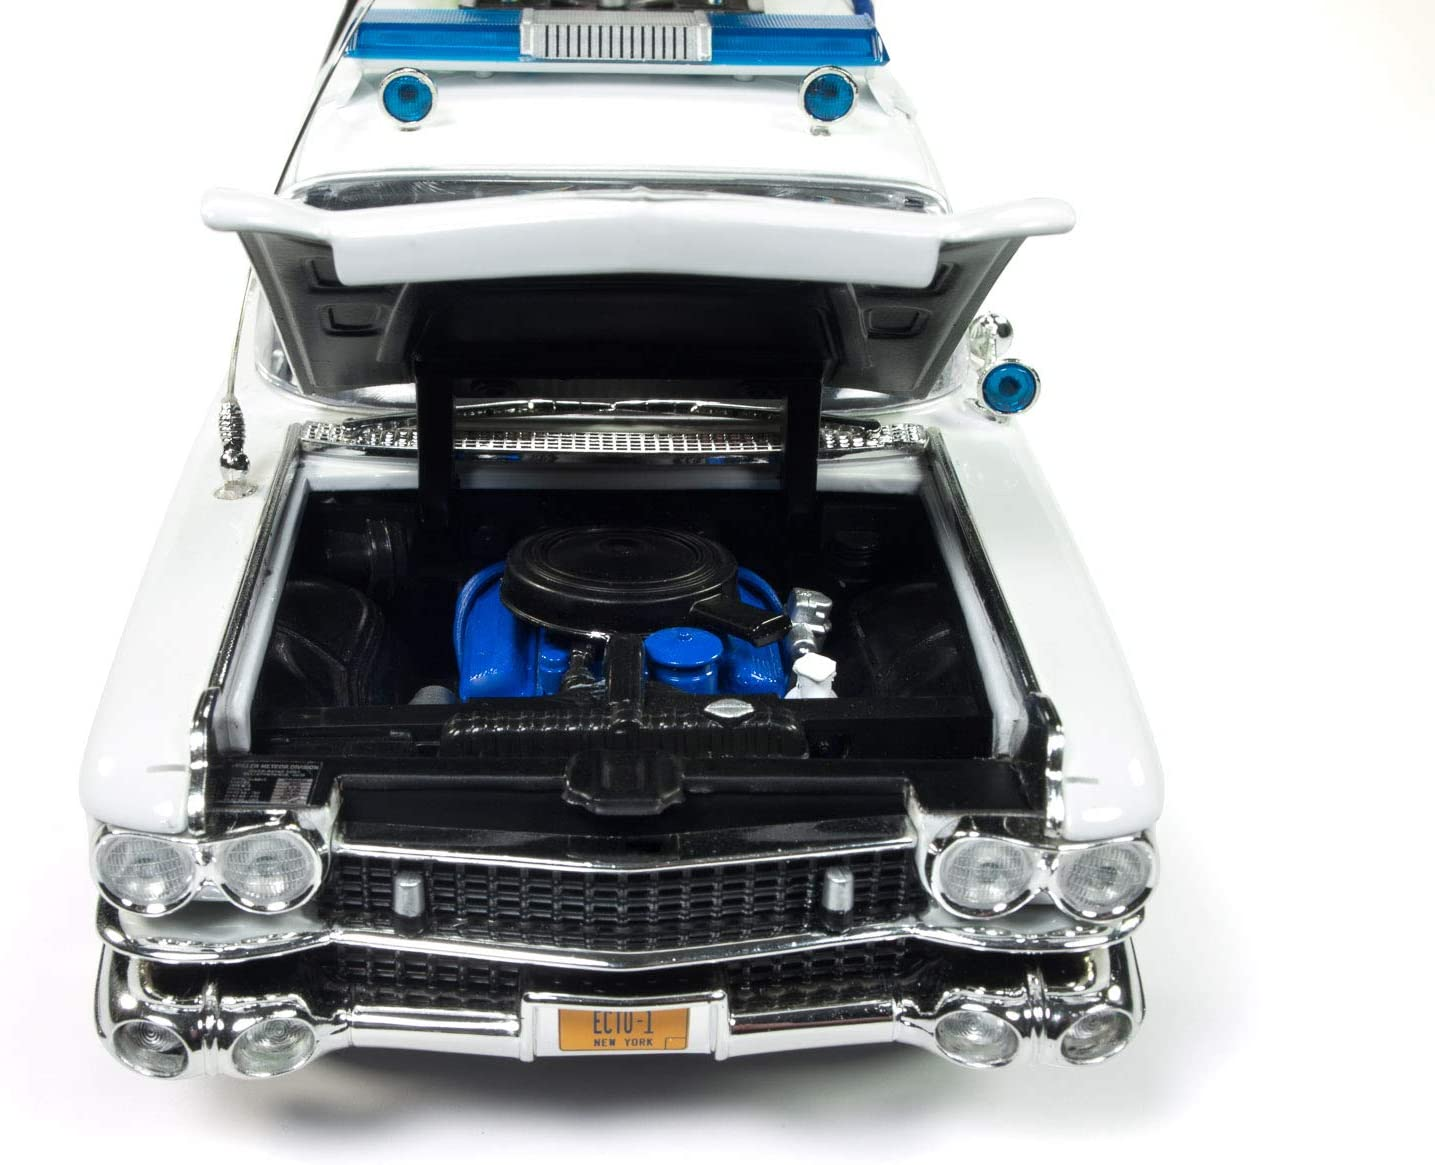 Miniatura Ecto 1 Os Caça Fantasmas 1 1959 Cadillac 1/18 Auto World